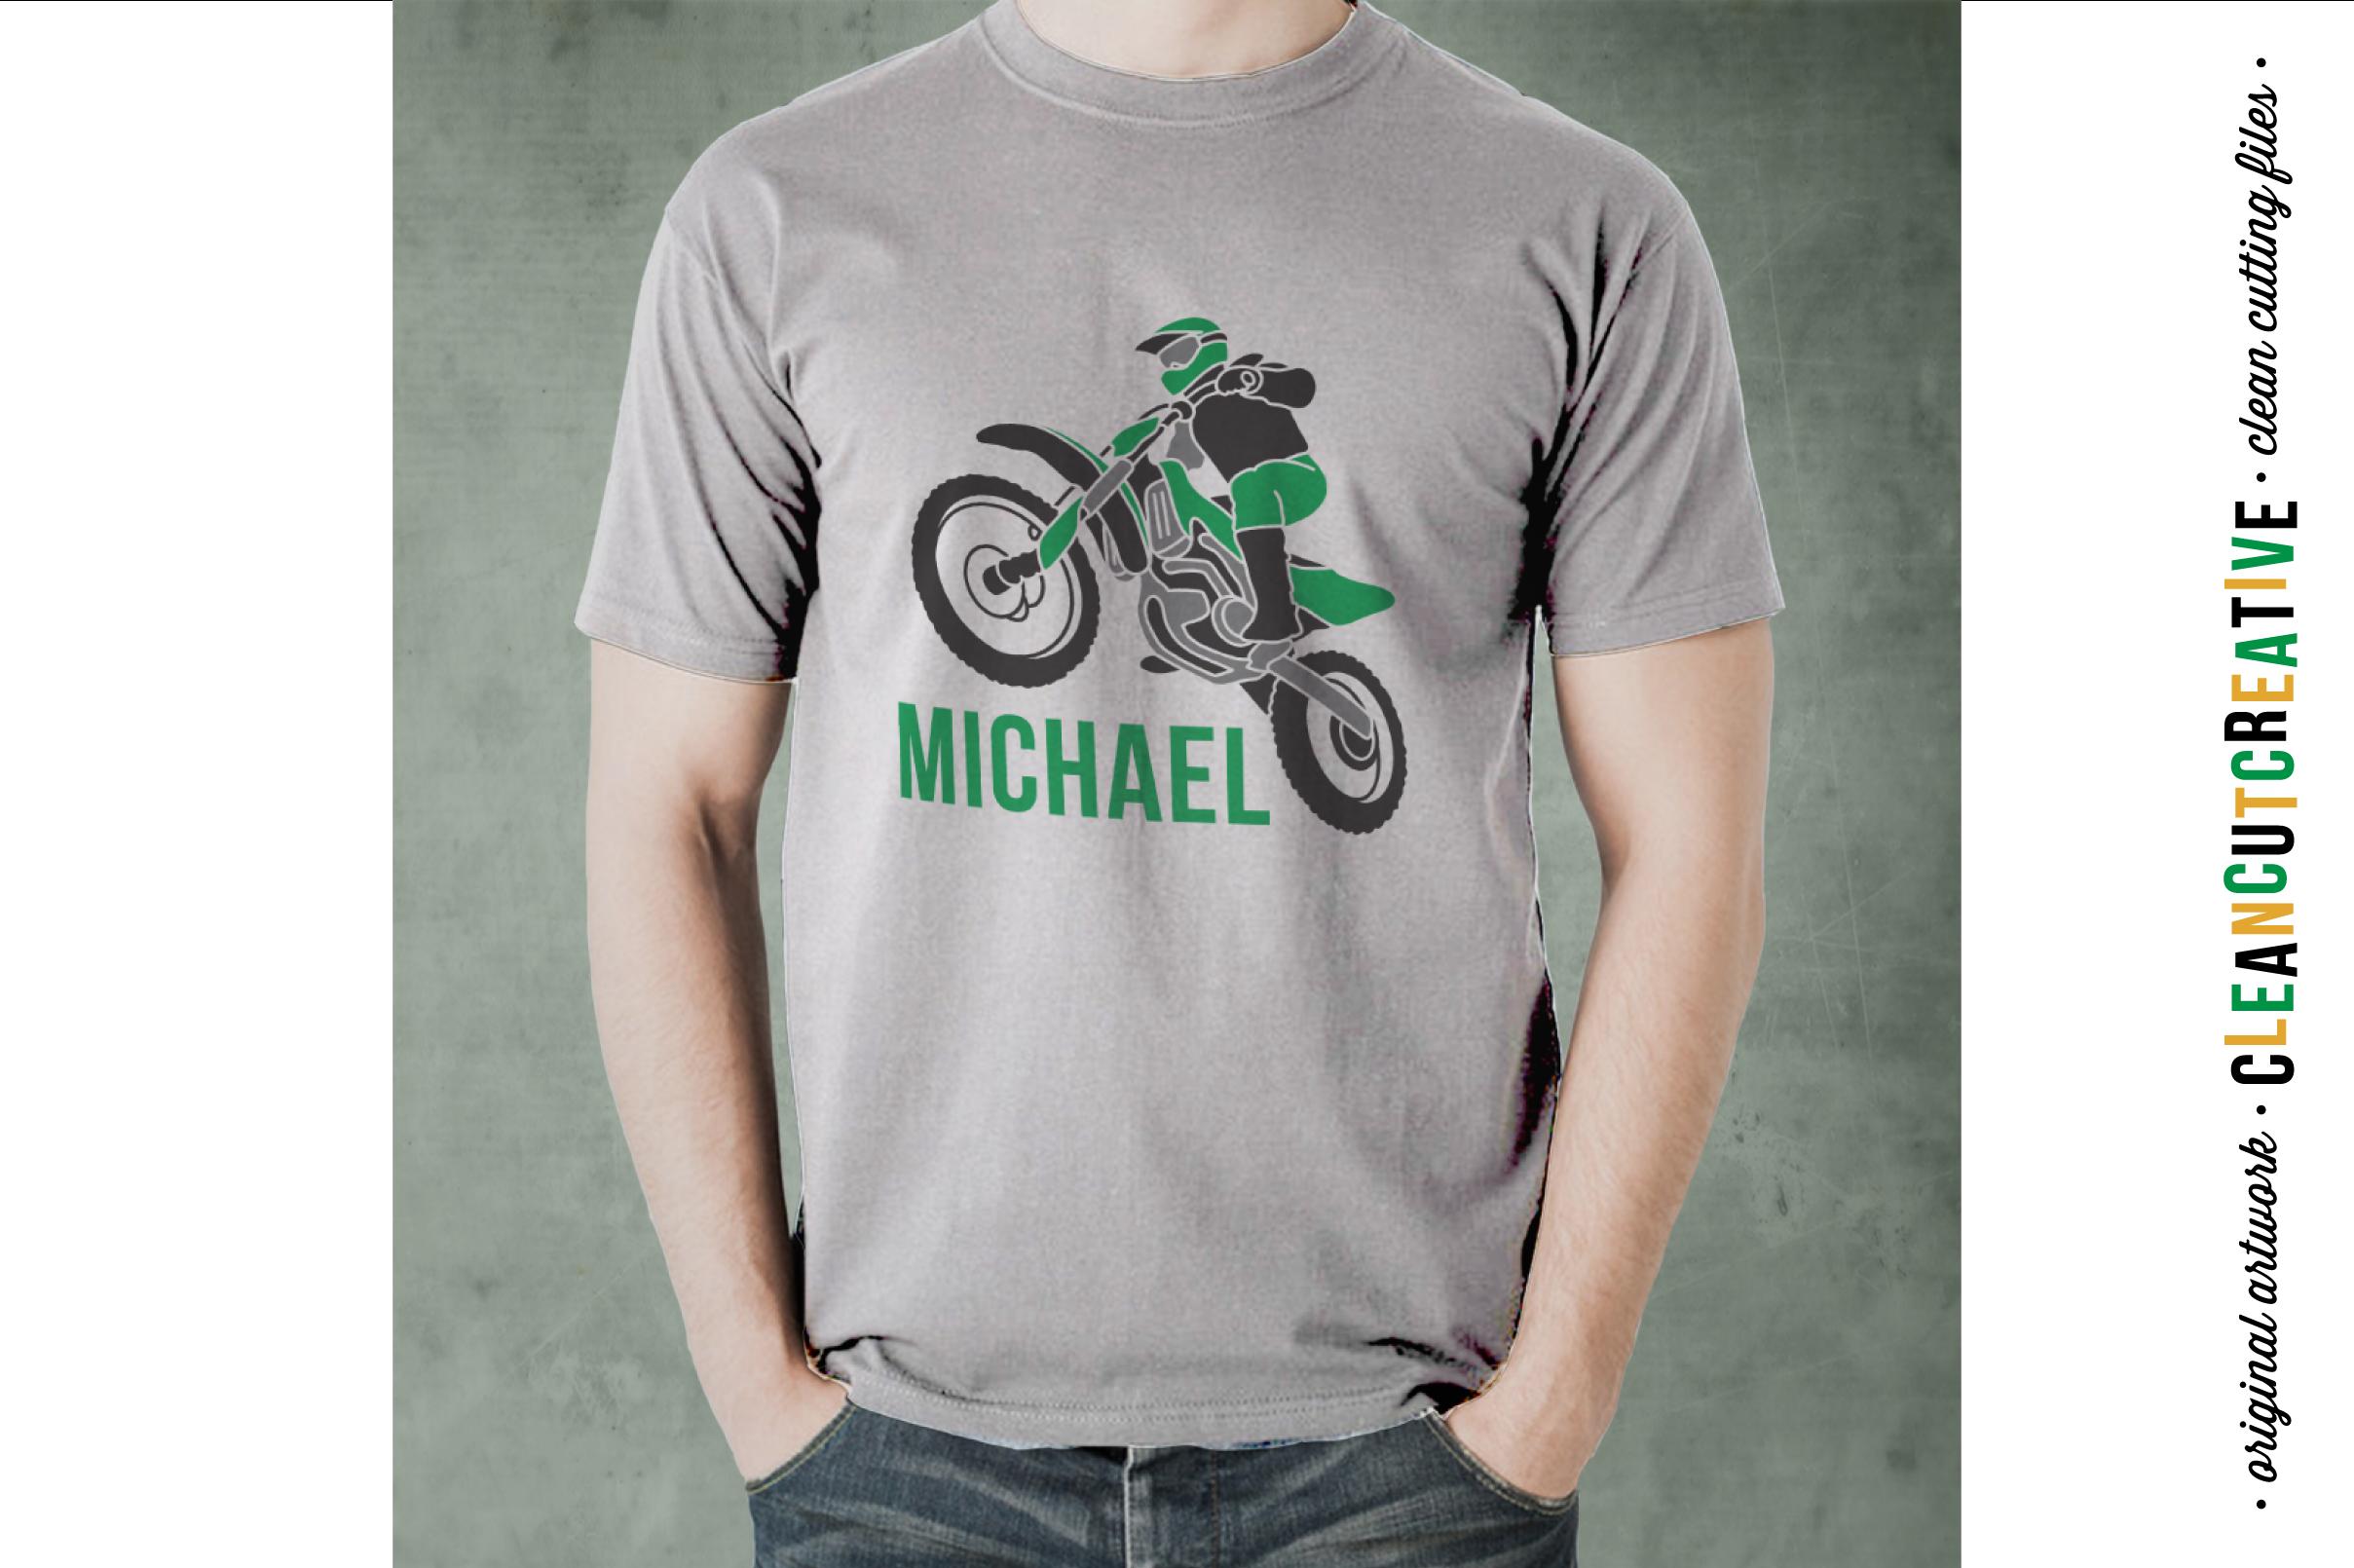 Motocross Dirt Bike design- SVG DXF EPSPNG - Cricut & Silhouette example image 2